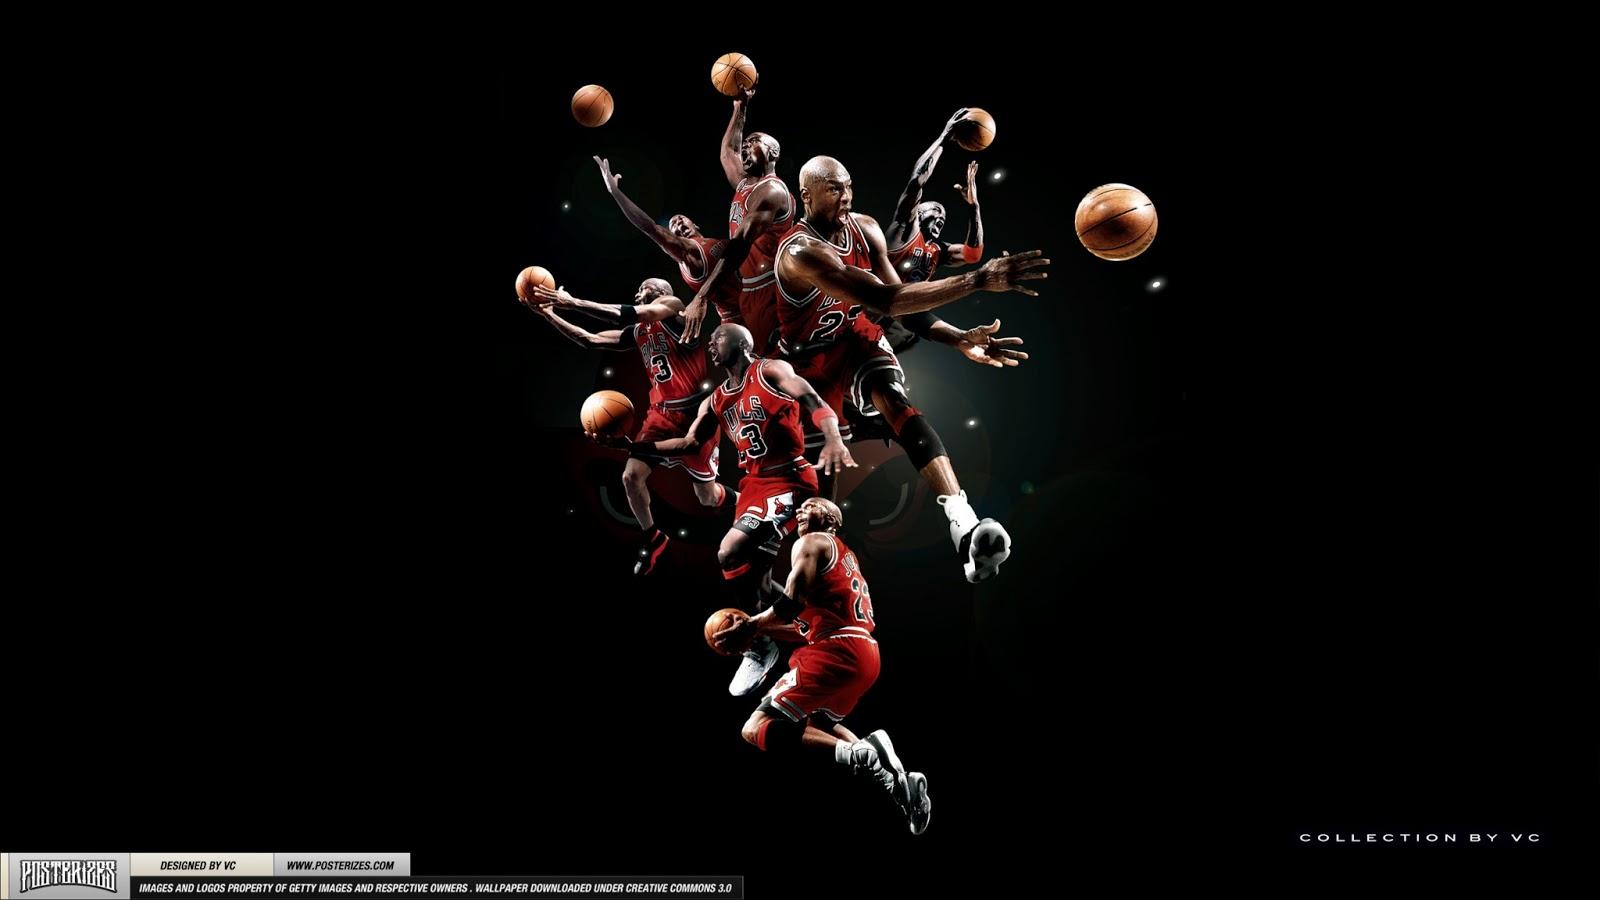 Michael Jordan HD Wallpapers HD Wallpapers 360 1600x900